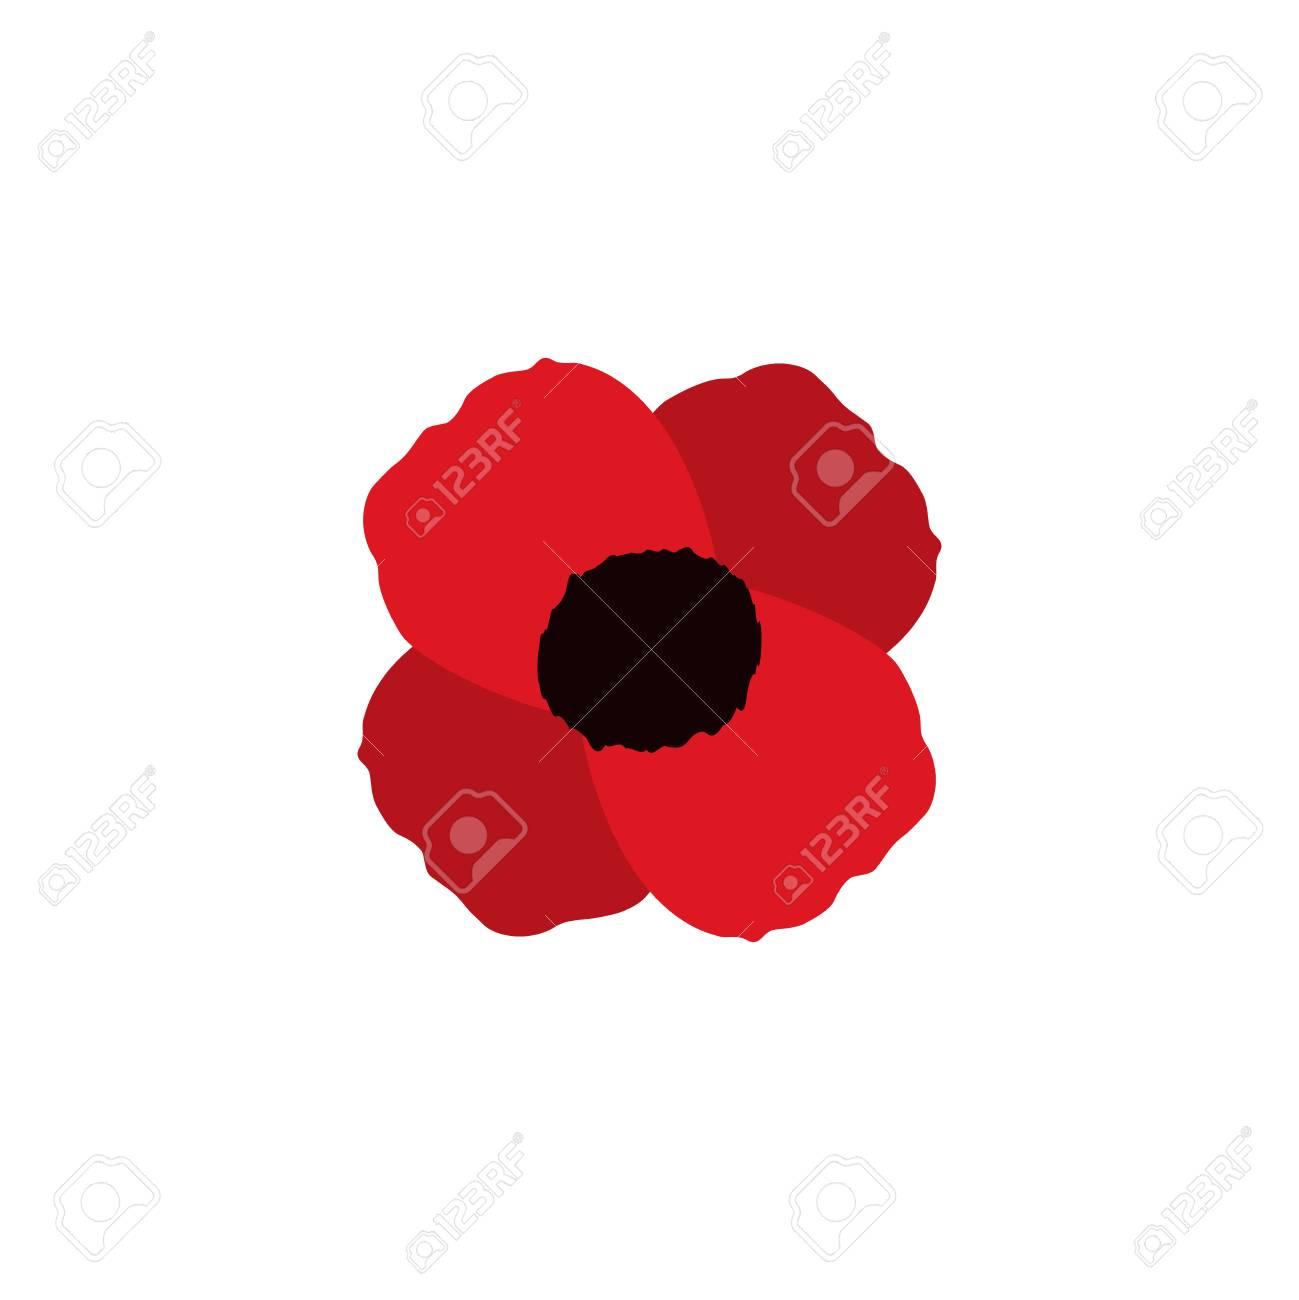 Red Poppy Vector Flower Memorial Symbol World War Icon Royalty Free